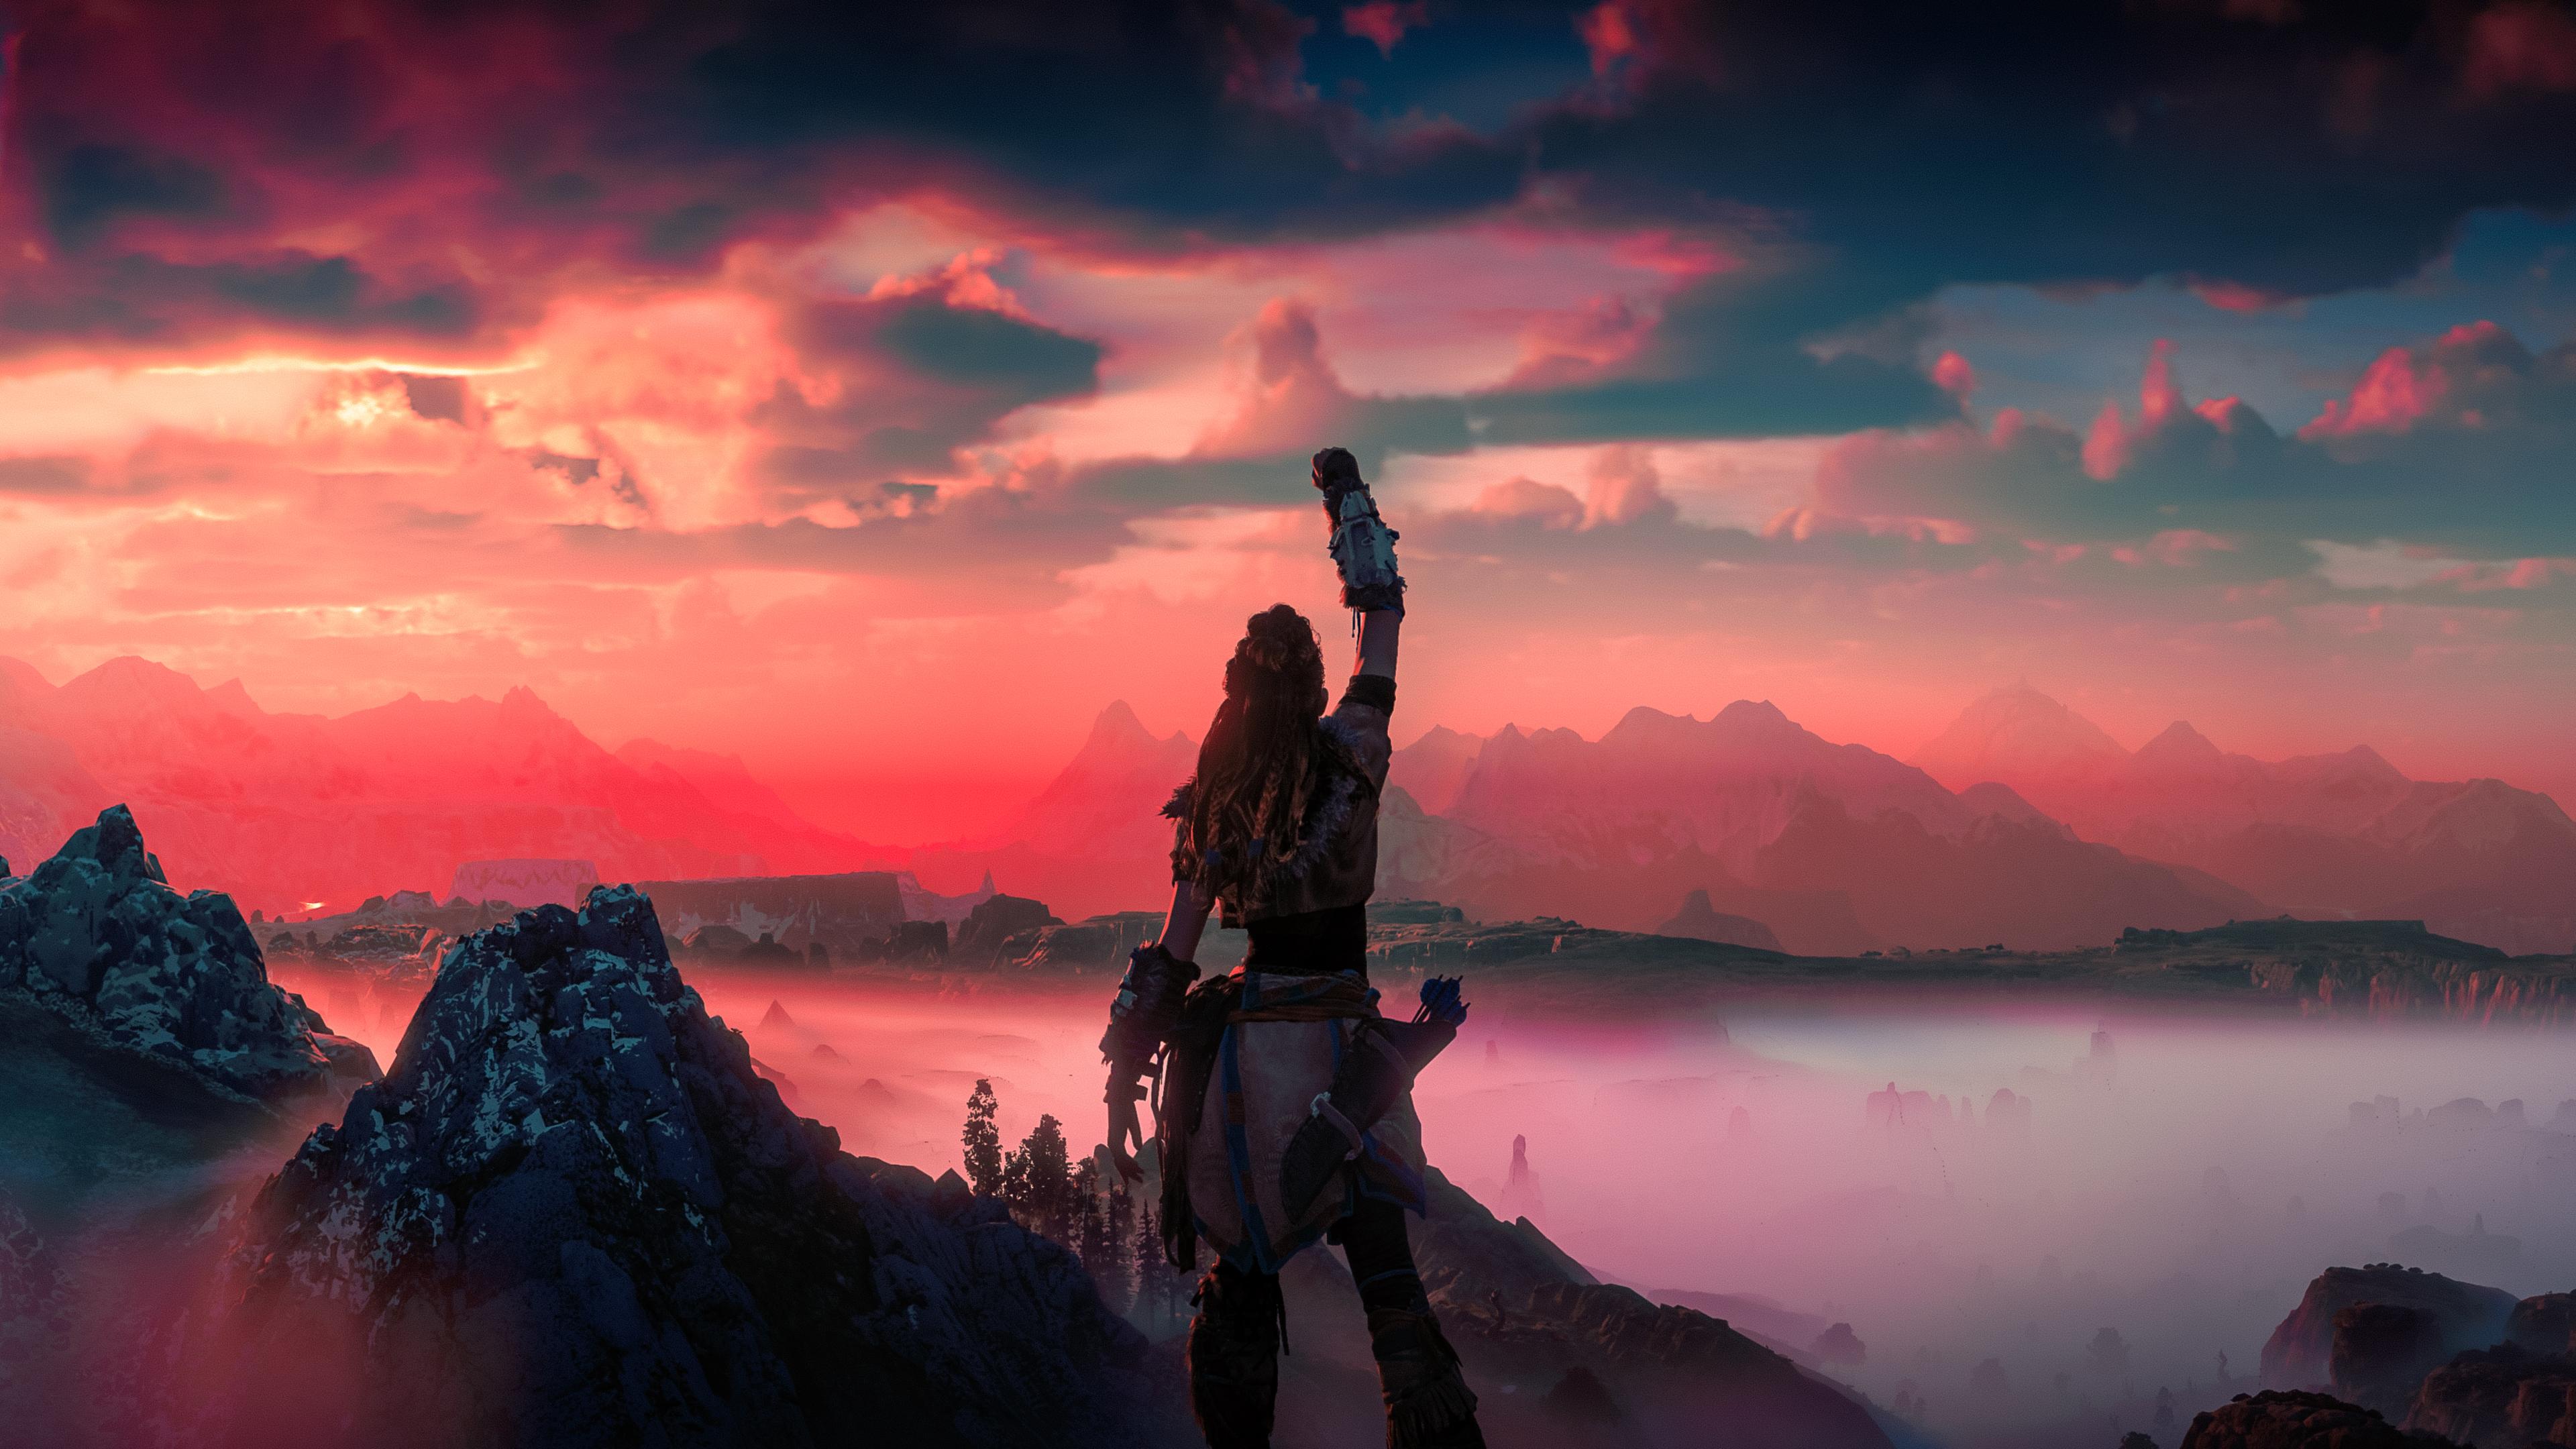 Horizon Zero Dawn Victory 4k - Horizon Zero Dawn 4k , HD Wallpaper & Backgrounds